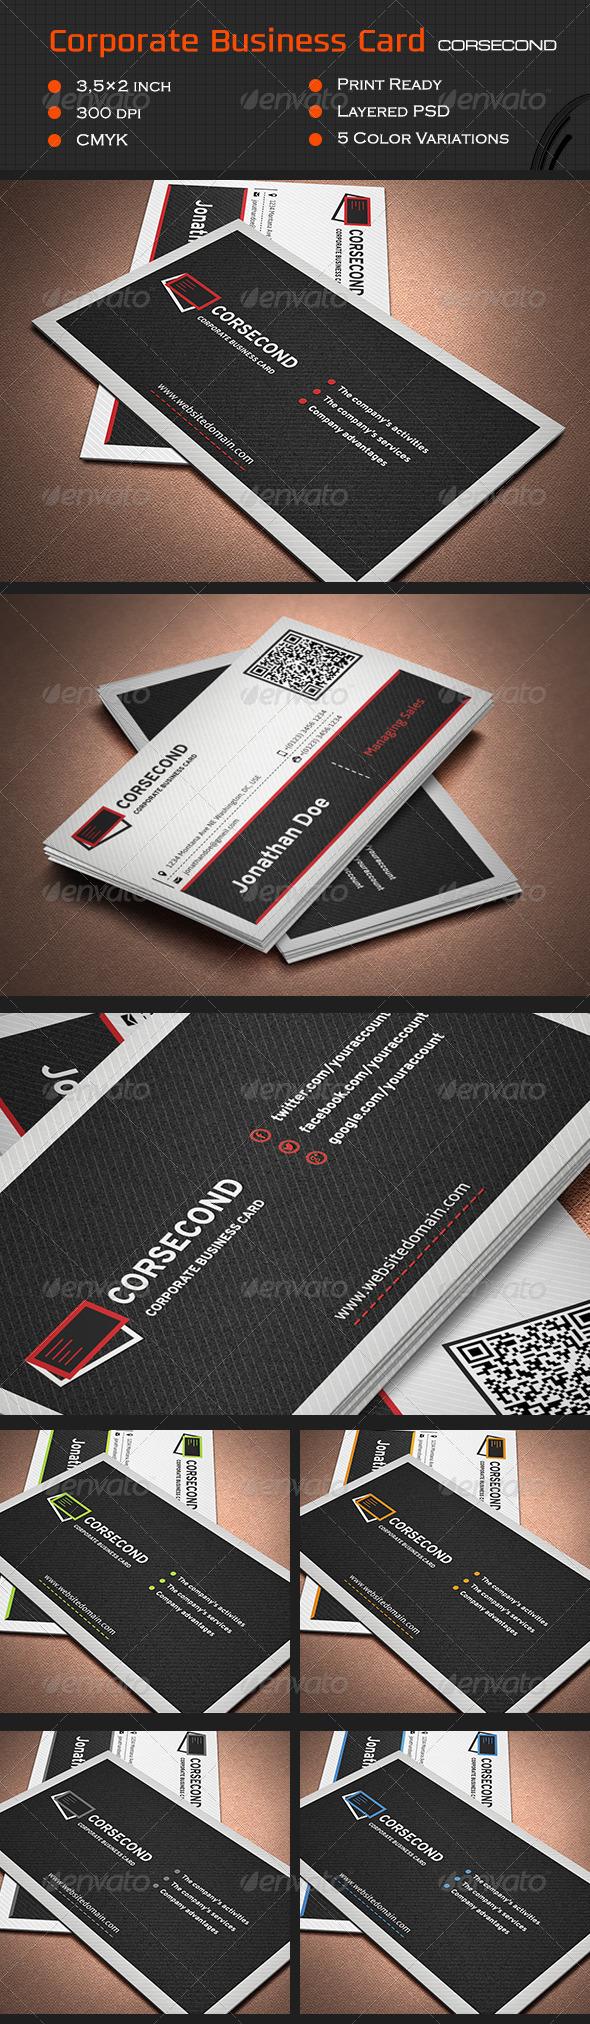 GraphicRiver Corporate Business Card Cor2 7010757